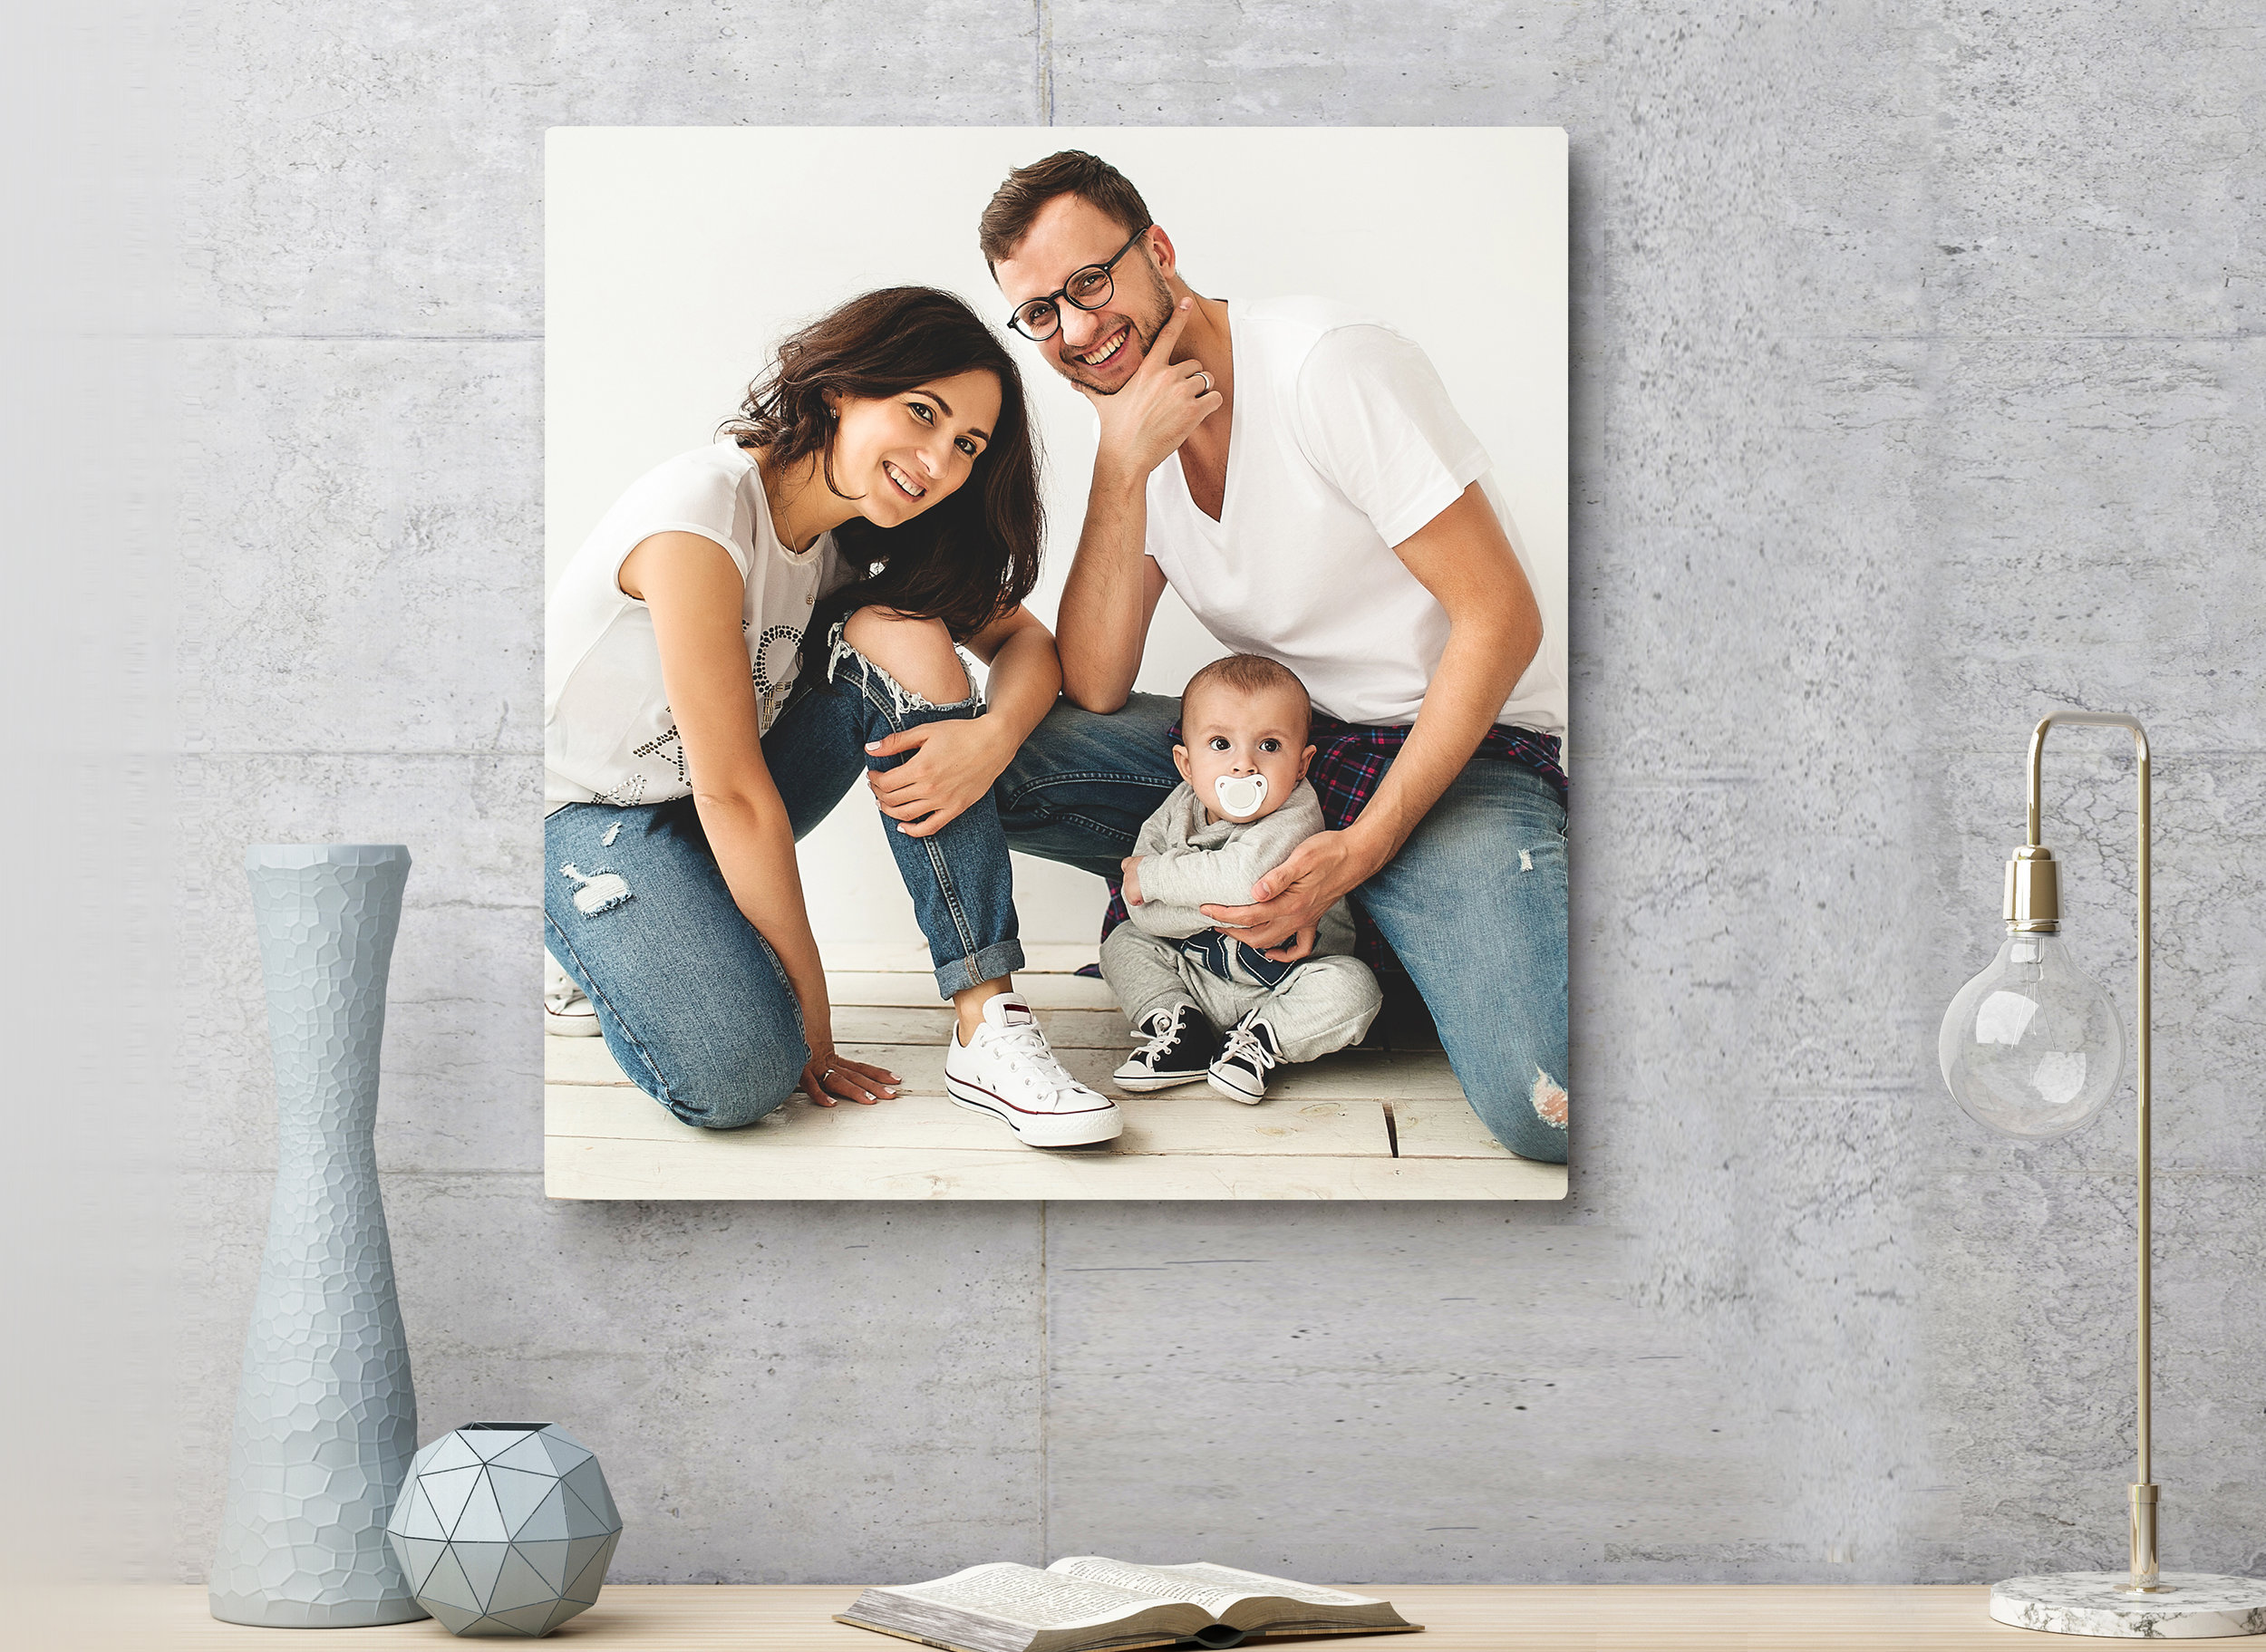 Canvas-Home-decor-13.jpg